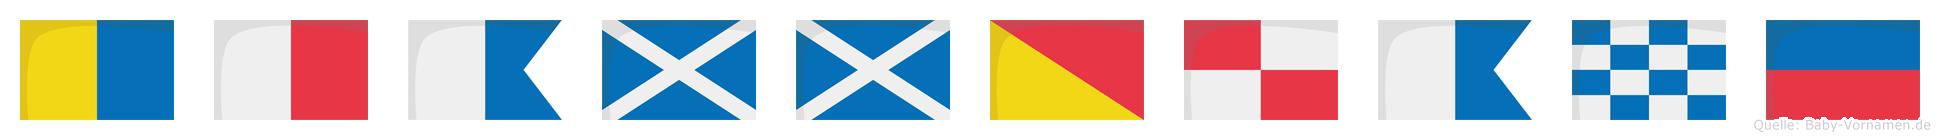 Khammouane im Flaggenalphabet